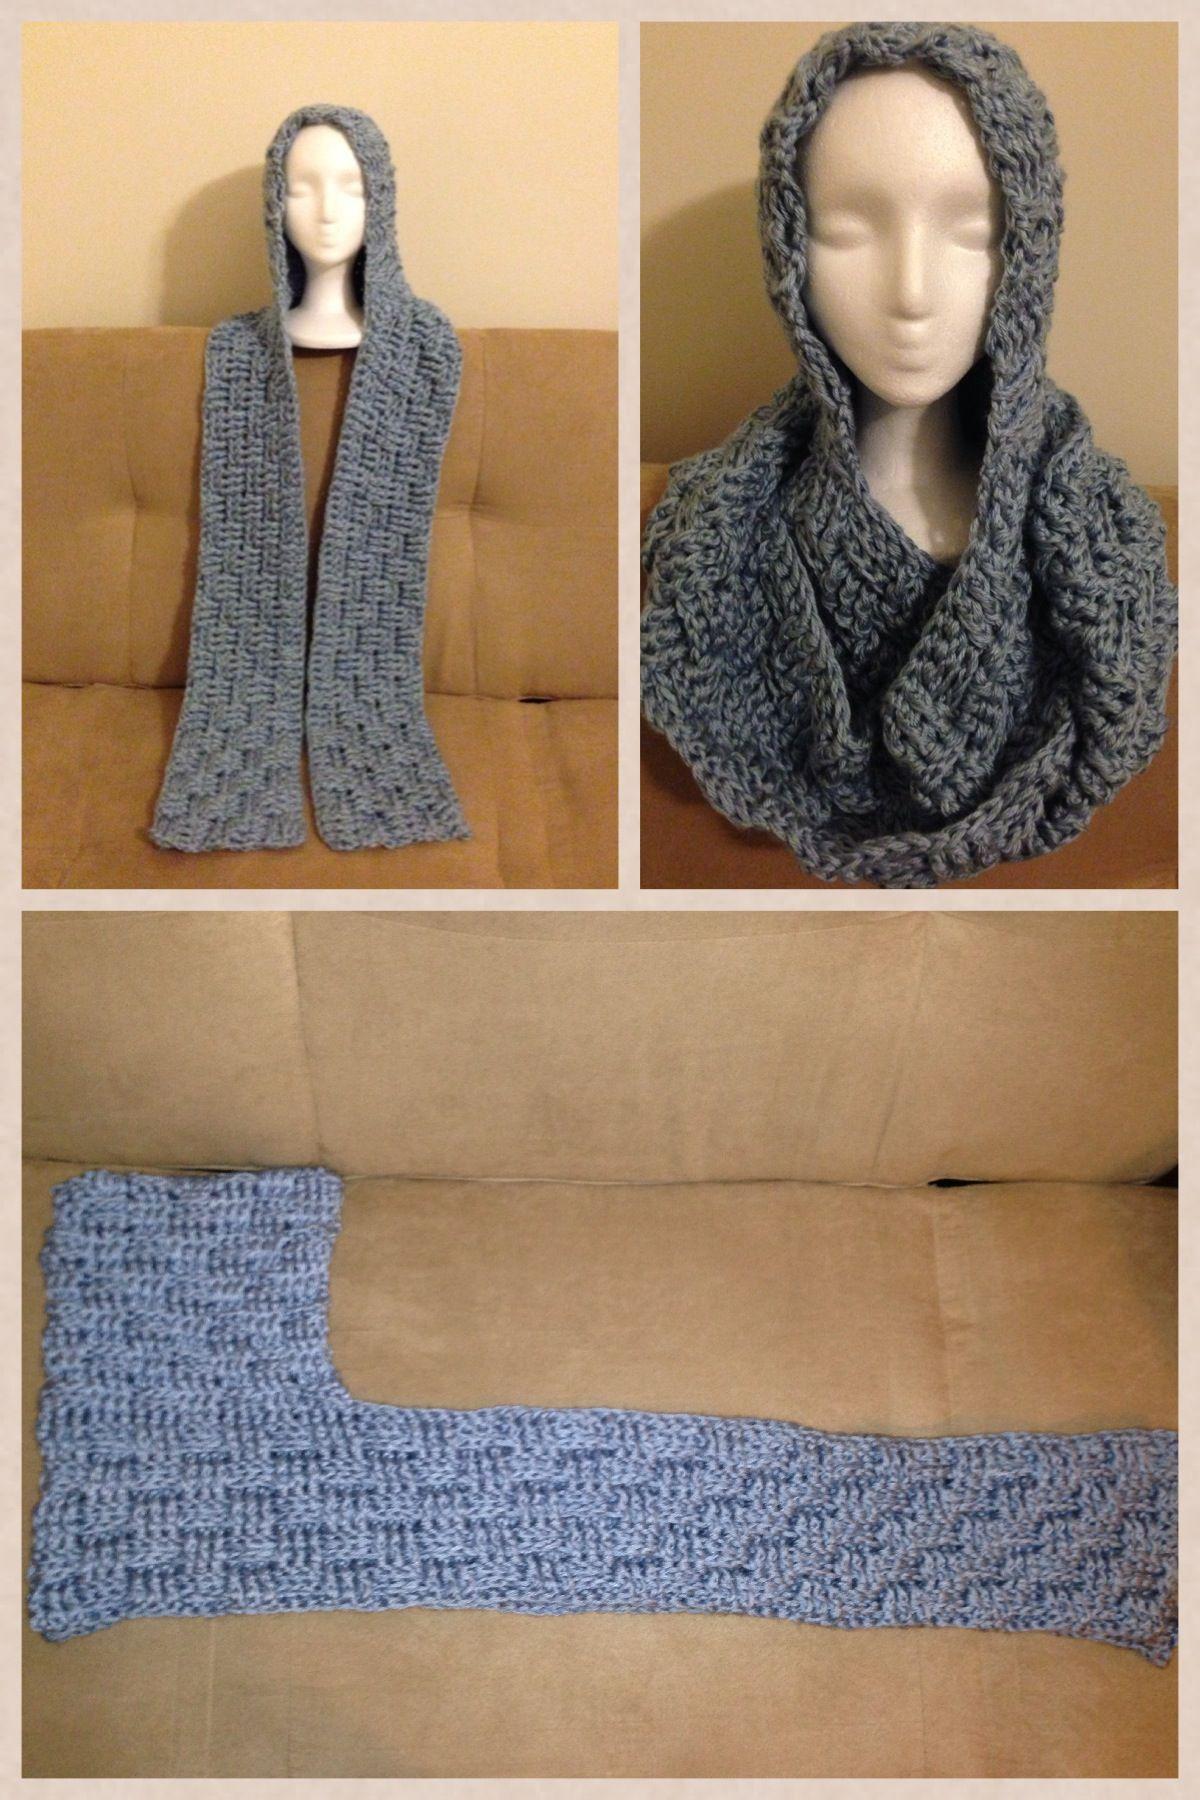 Basket weave stitch crochet hooded scarf | Crafts I Like | Pinterest ...